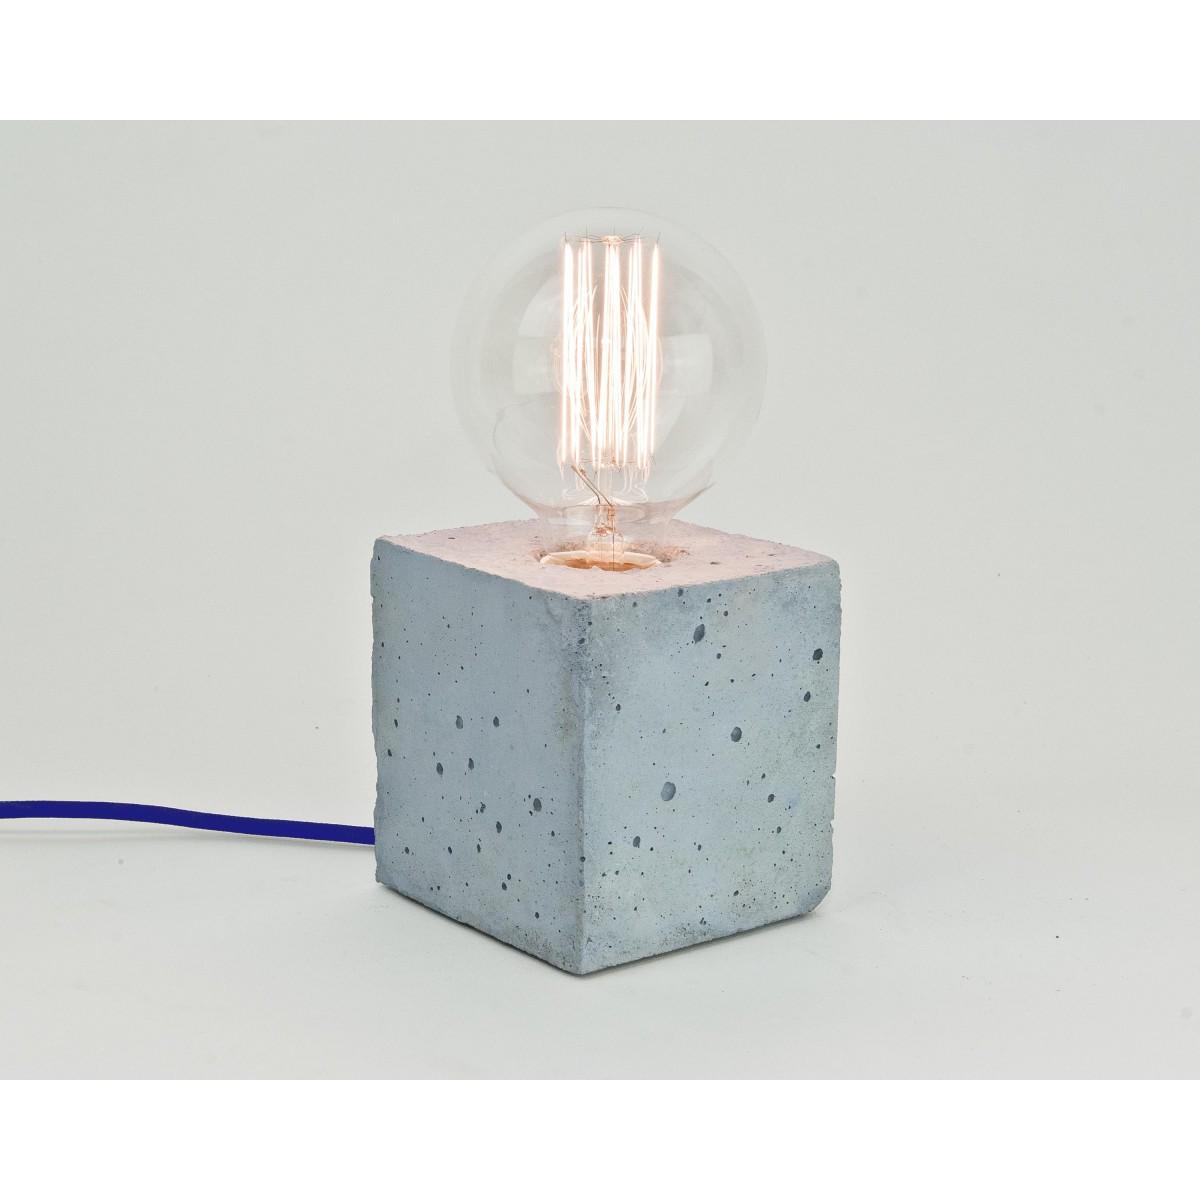 lj lamps alpha coloured blau tischleuchte aus beton mit. Black Bedroom Furniture Sets. Home Design Ideas